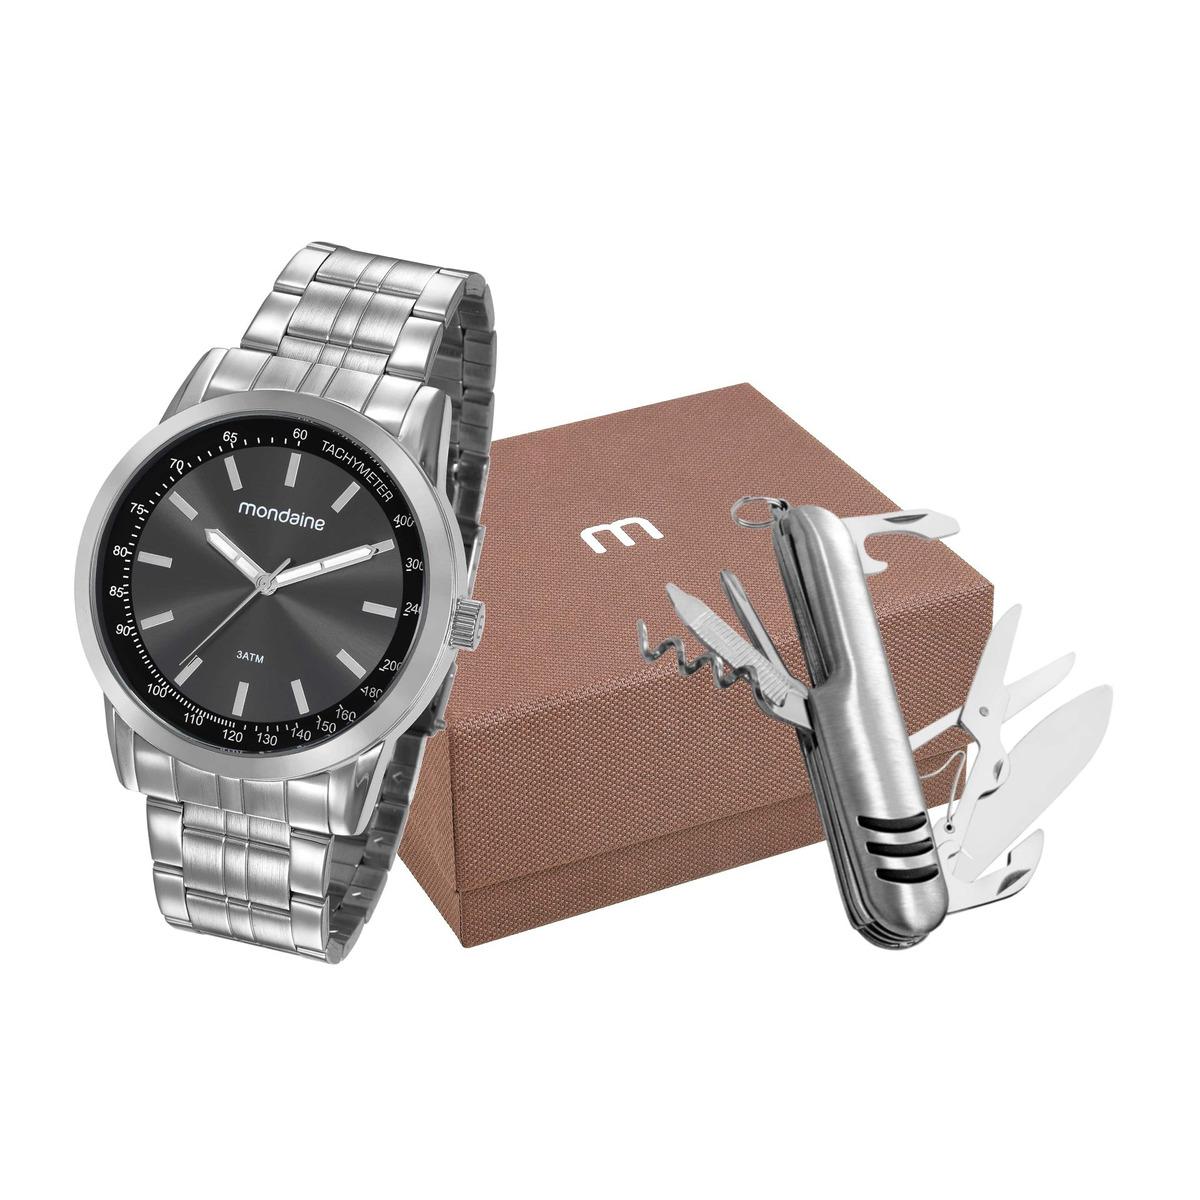 b27b71cc854 kit relógio mondaine masculino canivete 99318g0mgne1k1. Carregando zoom.